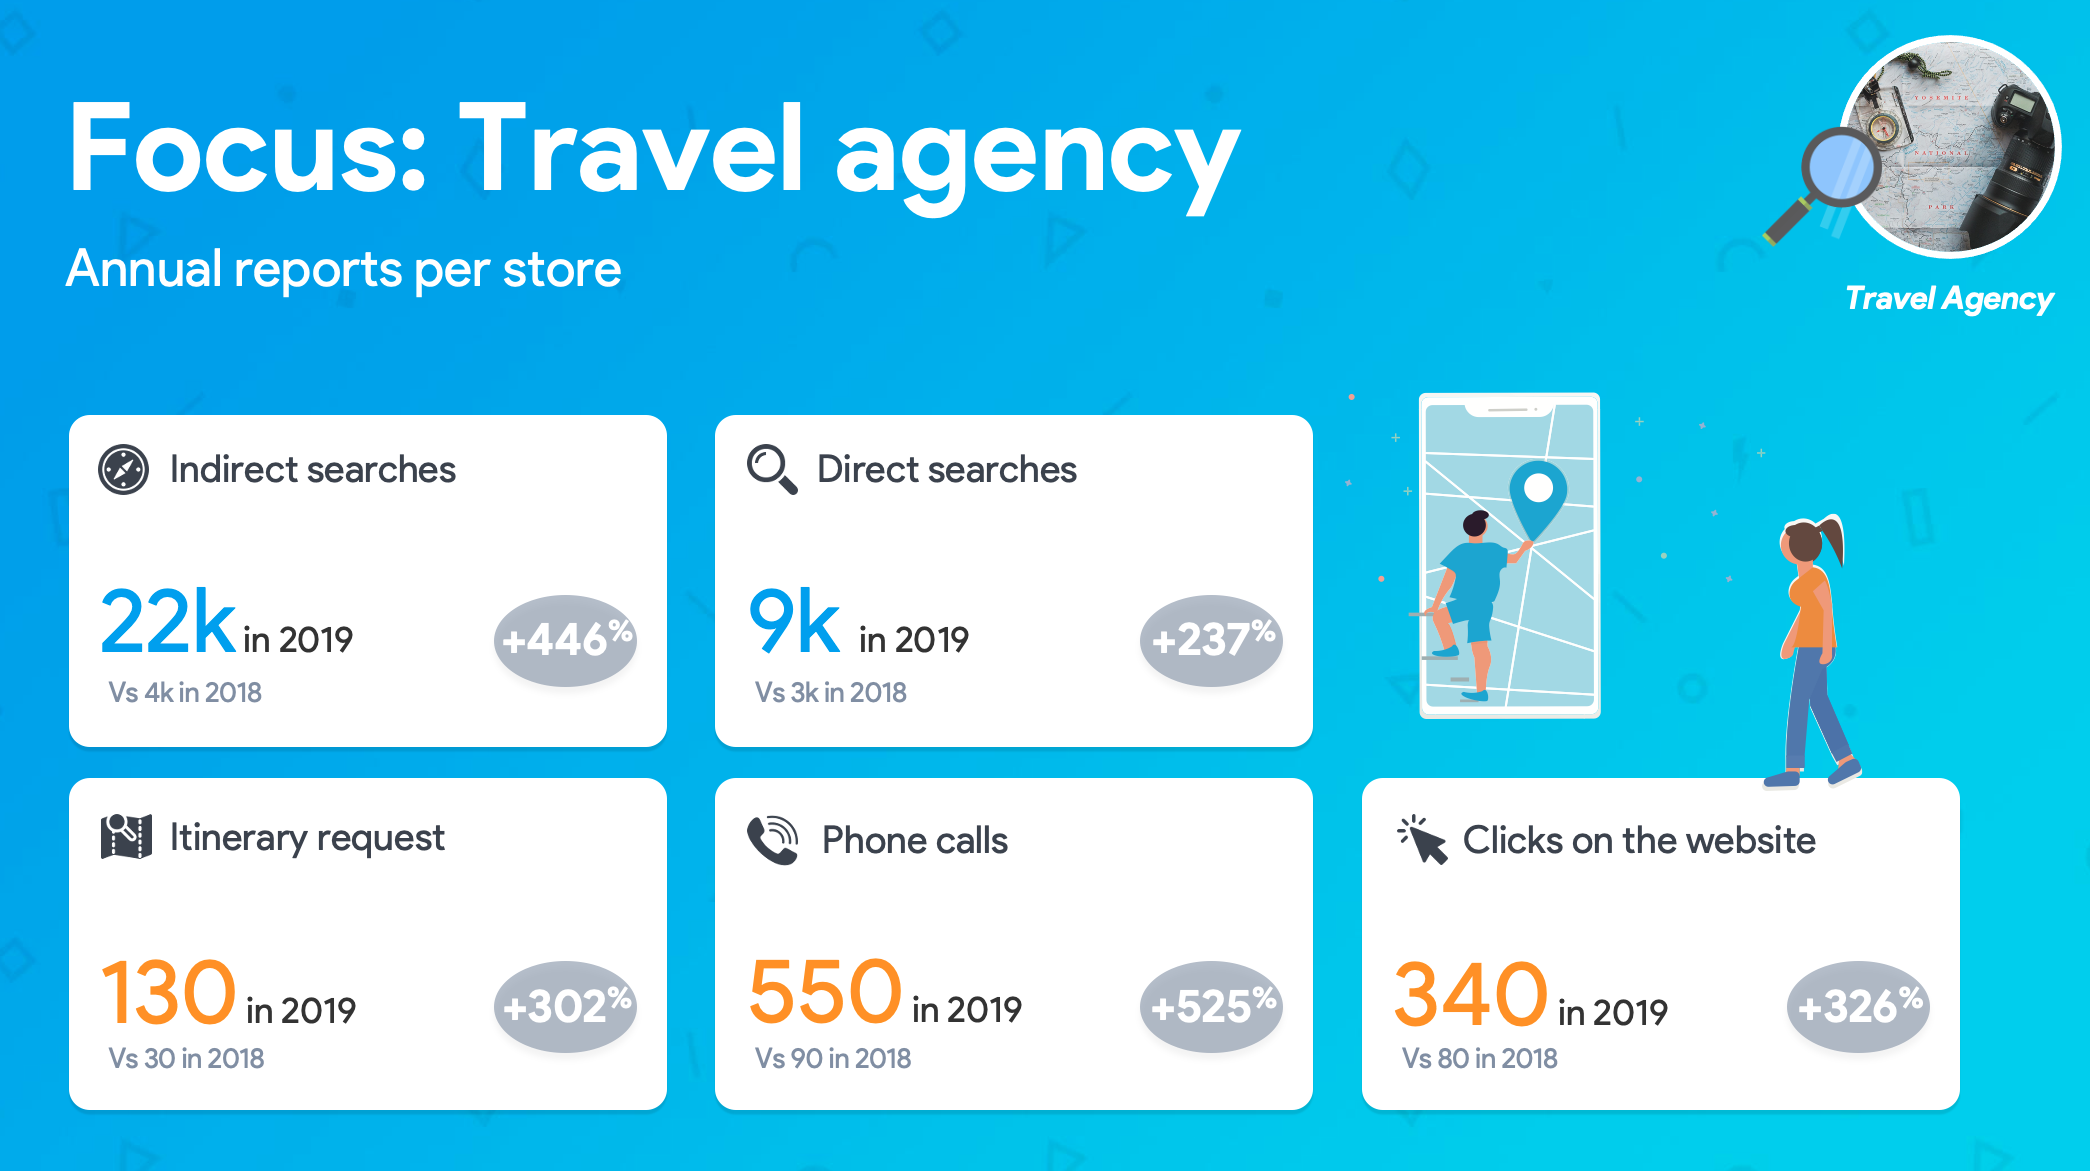 Travel agency data on GMB